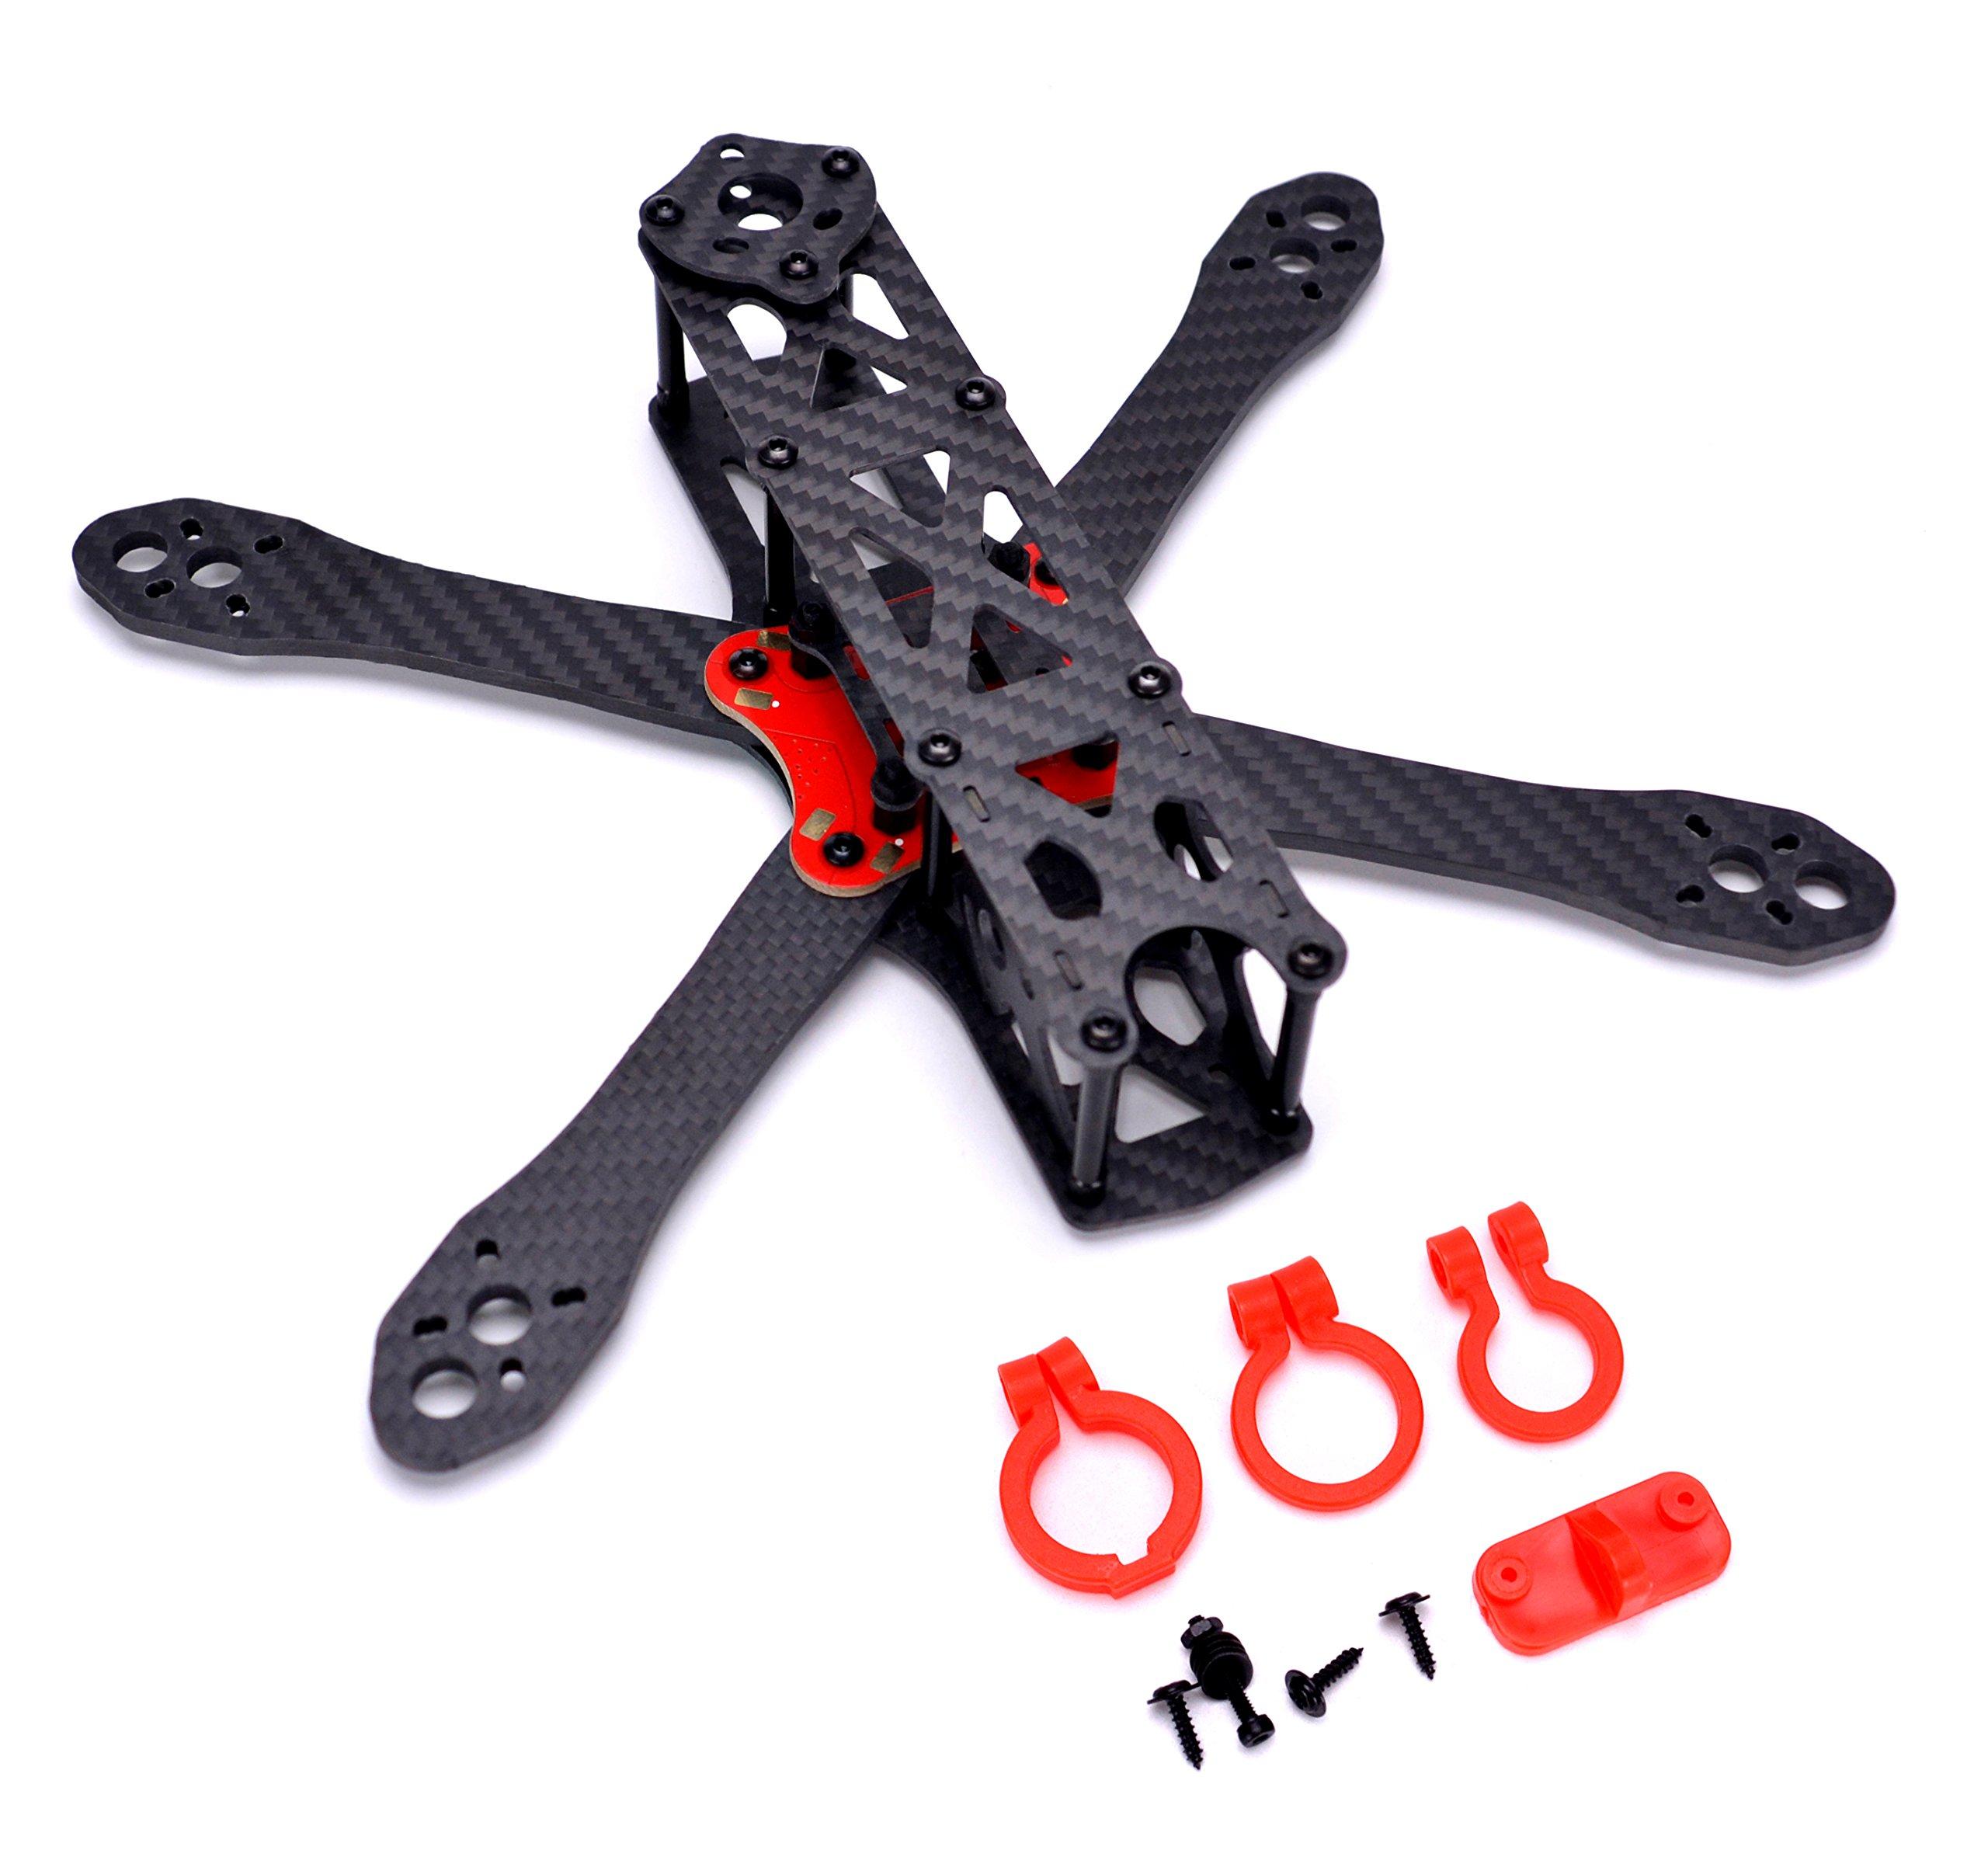 FPVDrone 225mm FPV Racing Drone Frame Stretch-X Carbon Fiber Quadcopter Frame Kit 4mm Arm+Power Distribution Board PDB+FPV Camera Lens Holder Set